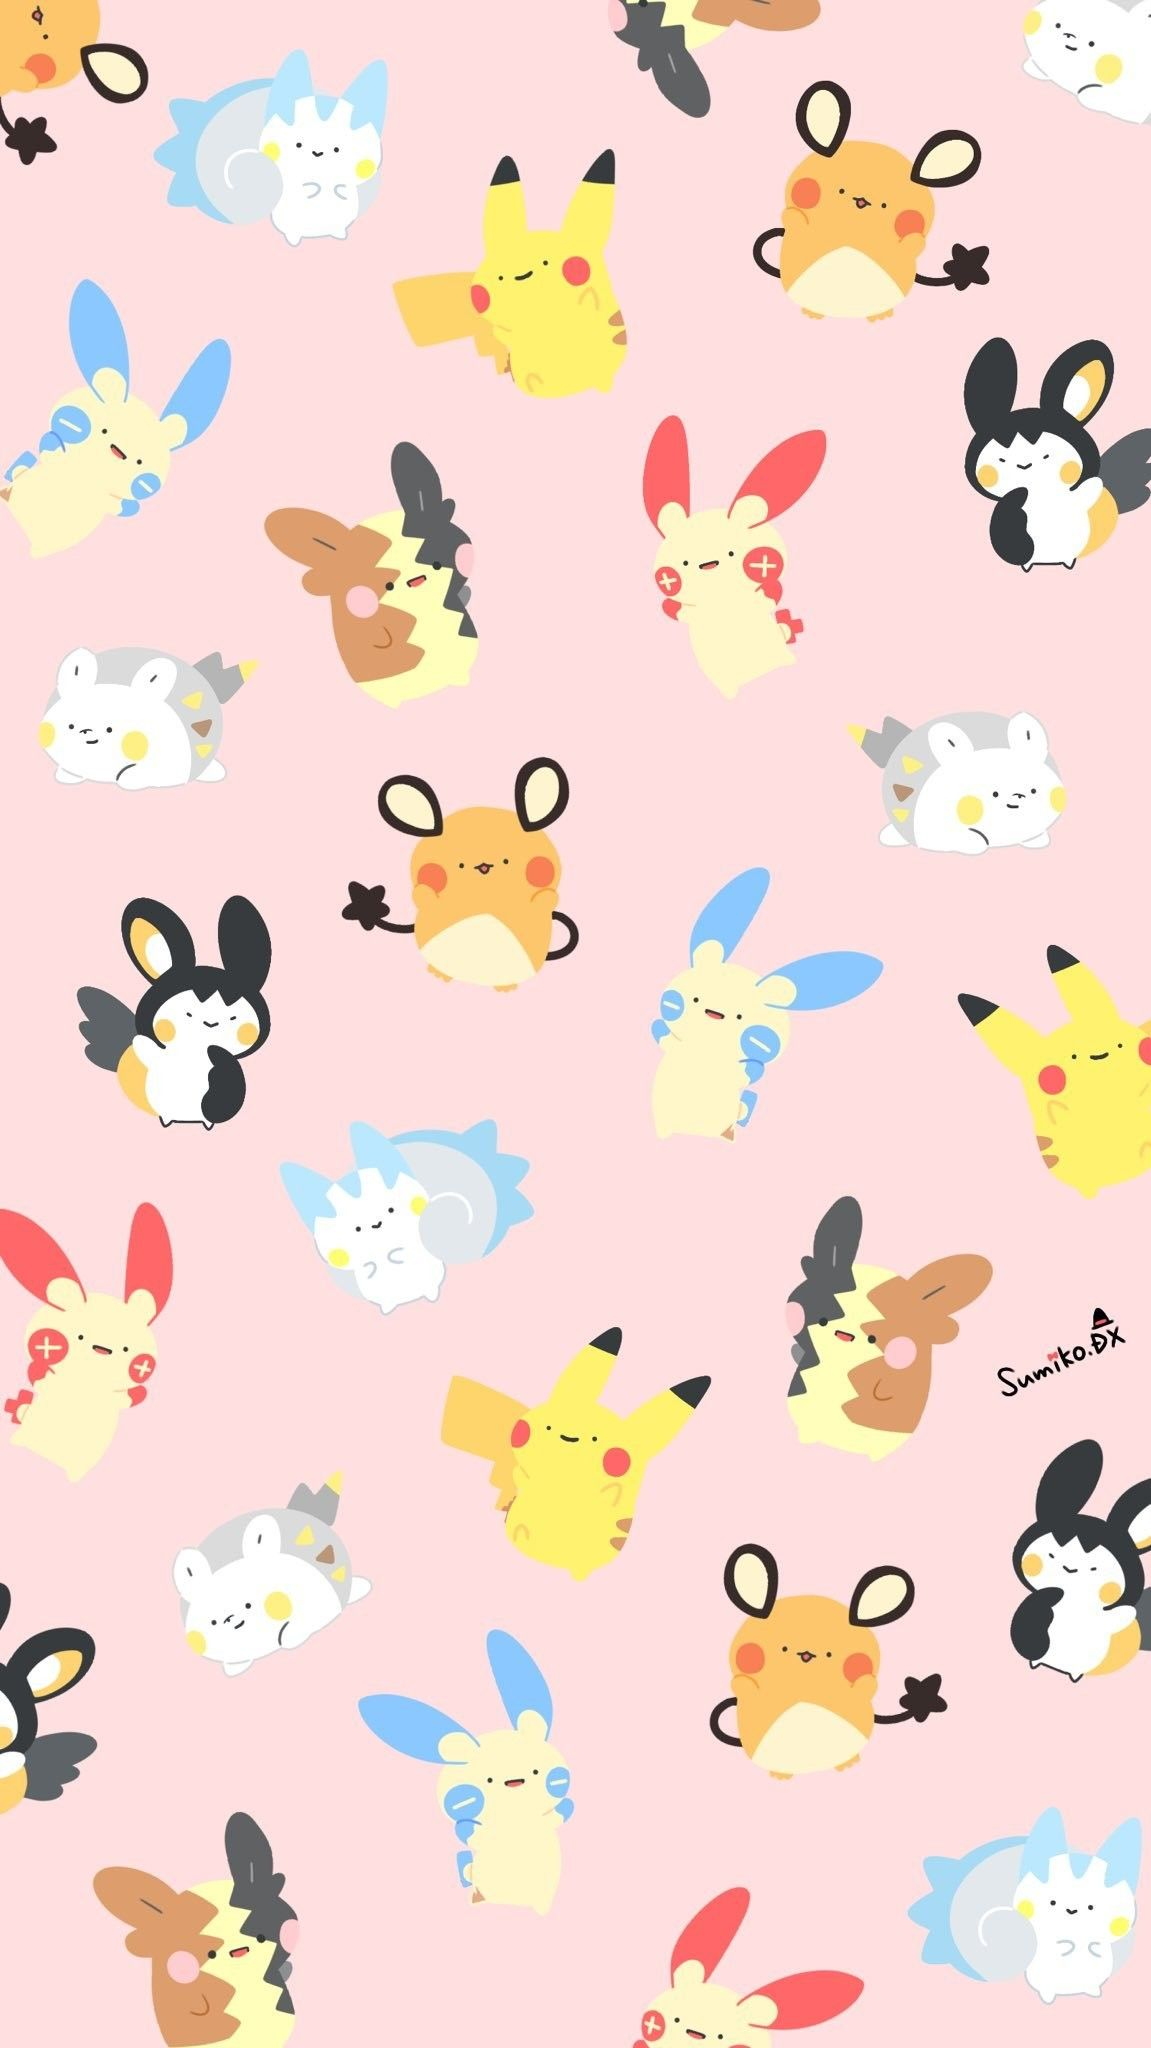 Pin By Nur Sabrina On Pokemon In 2021 Cute Pokemon Wallpaper Pokemon Backgrounds Iphone Wallpaper Pokemon